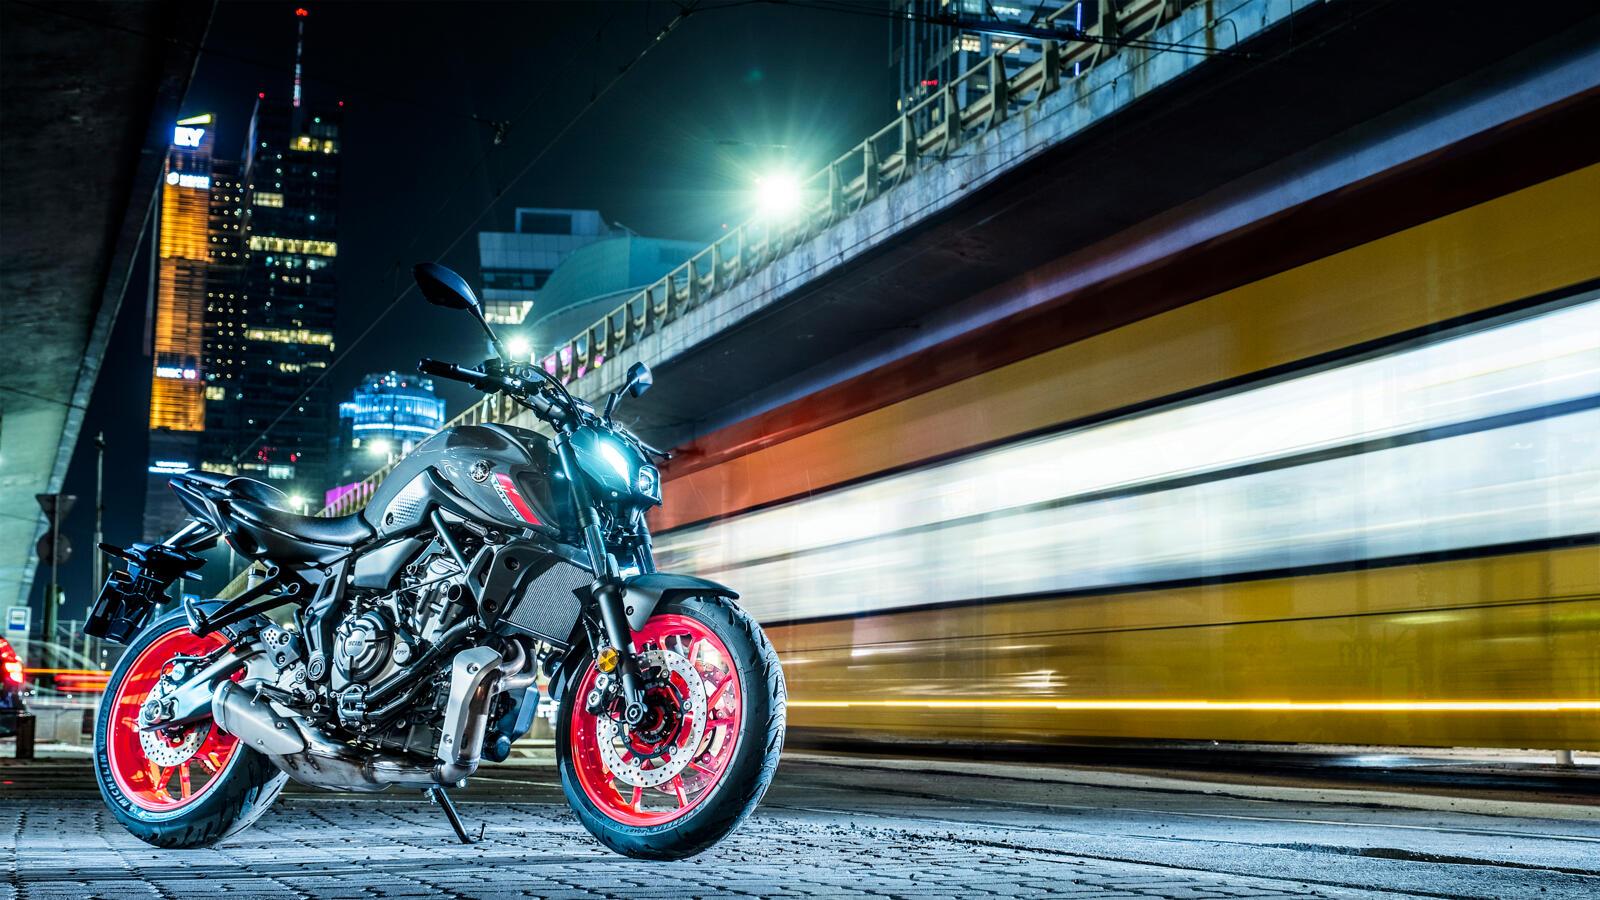 Yamaha-MT-07-my2021-29